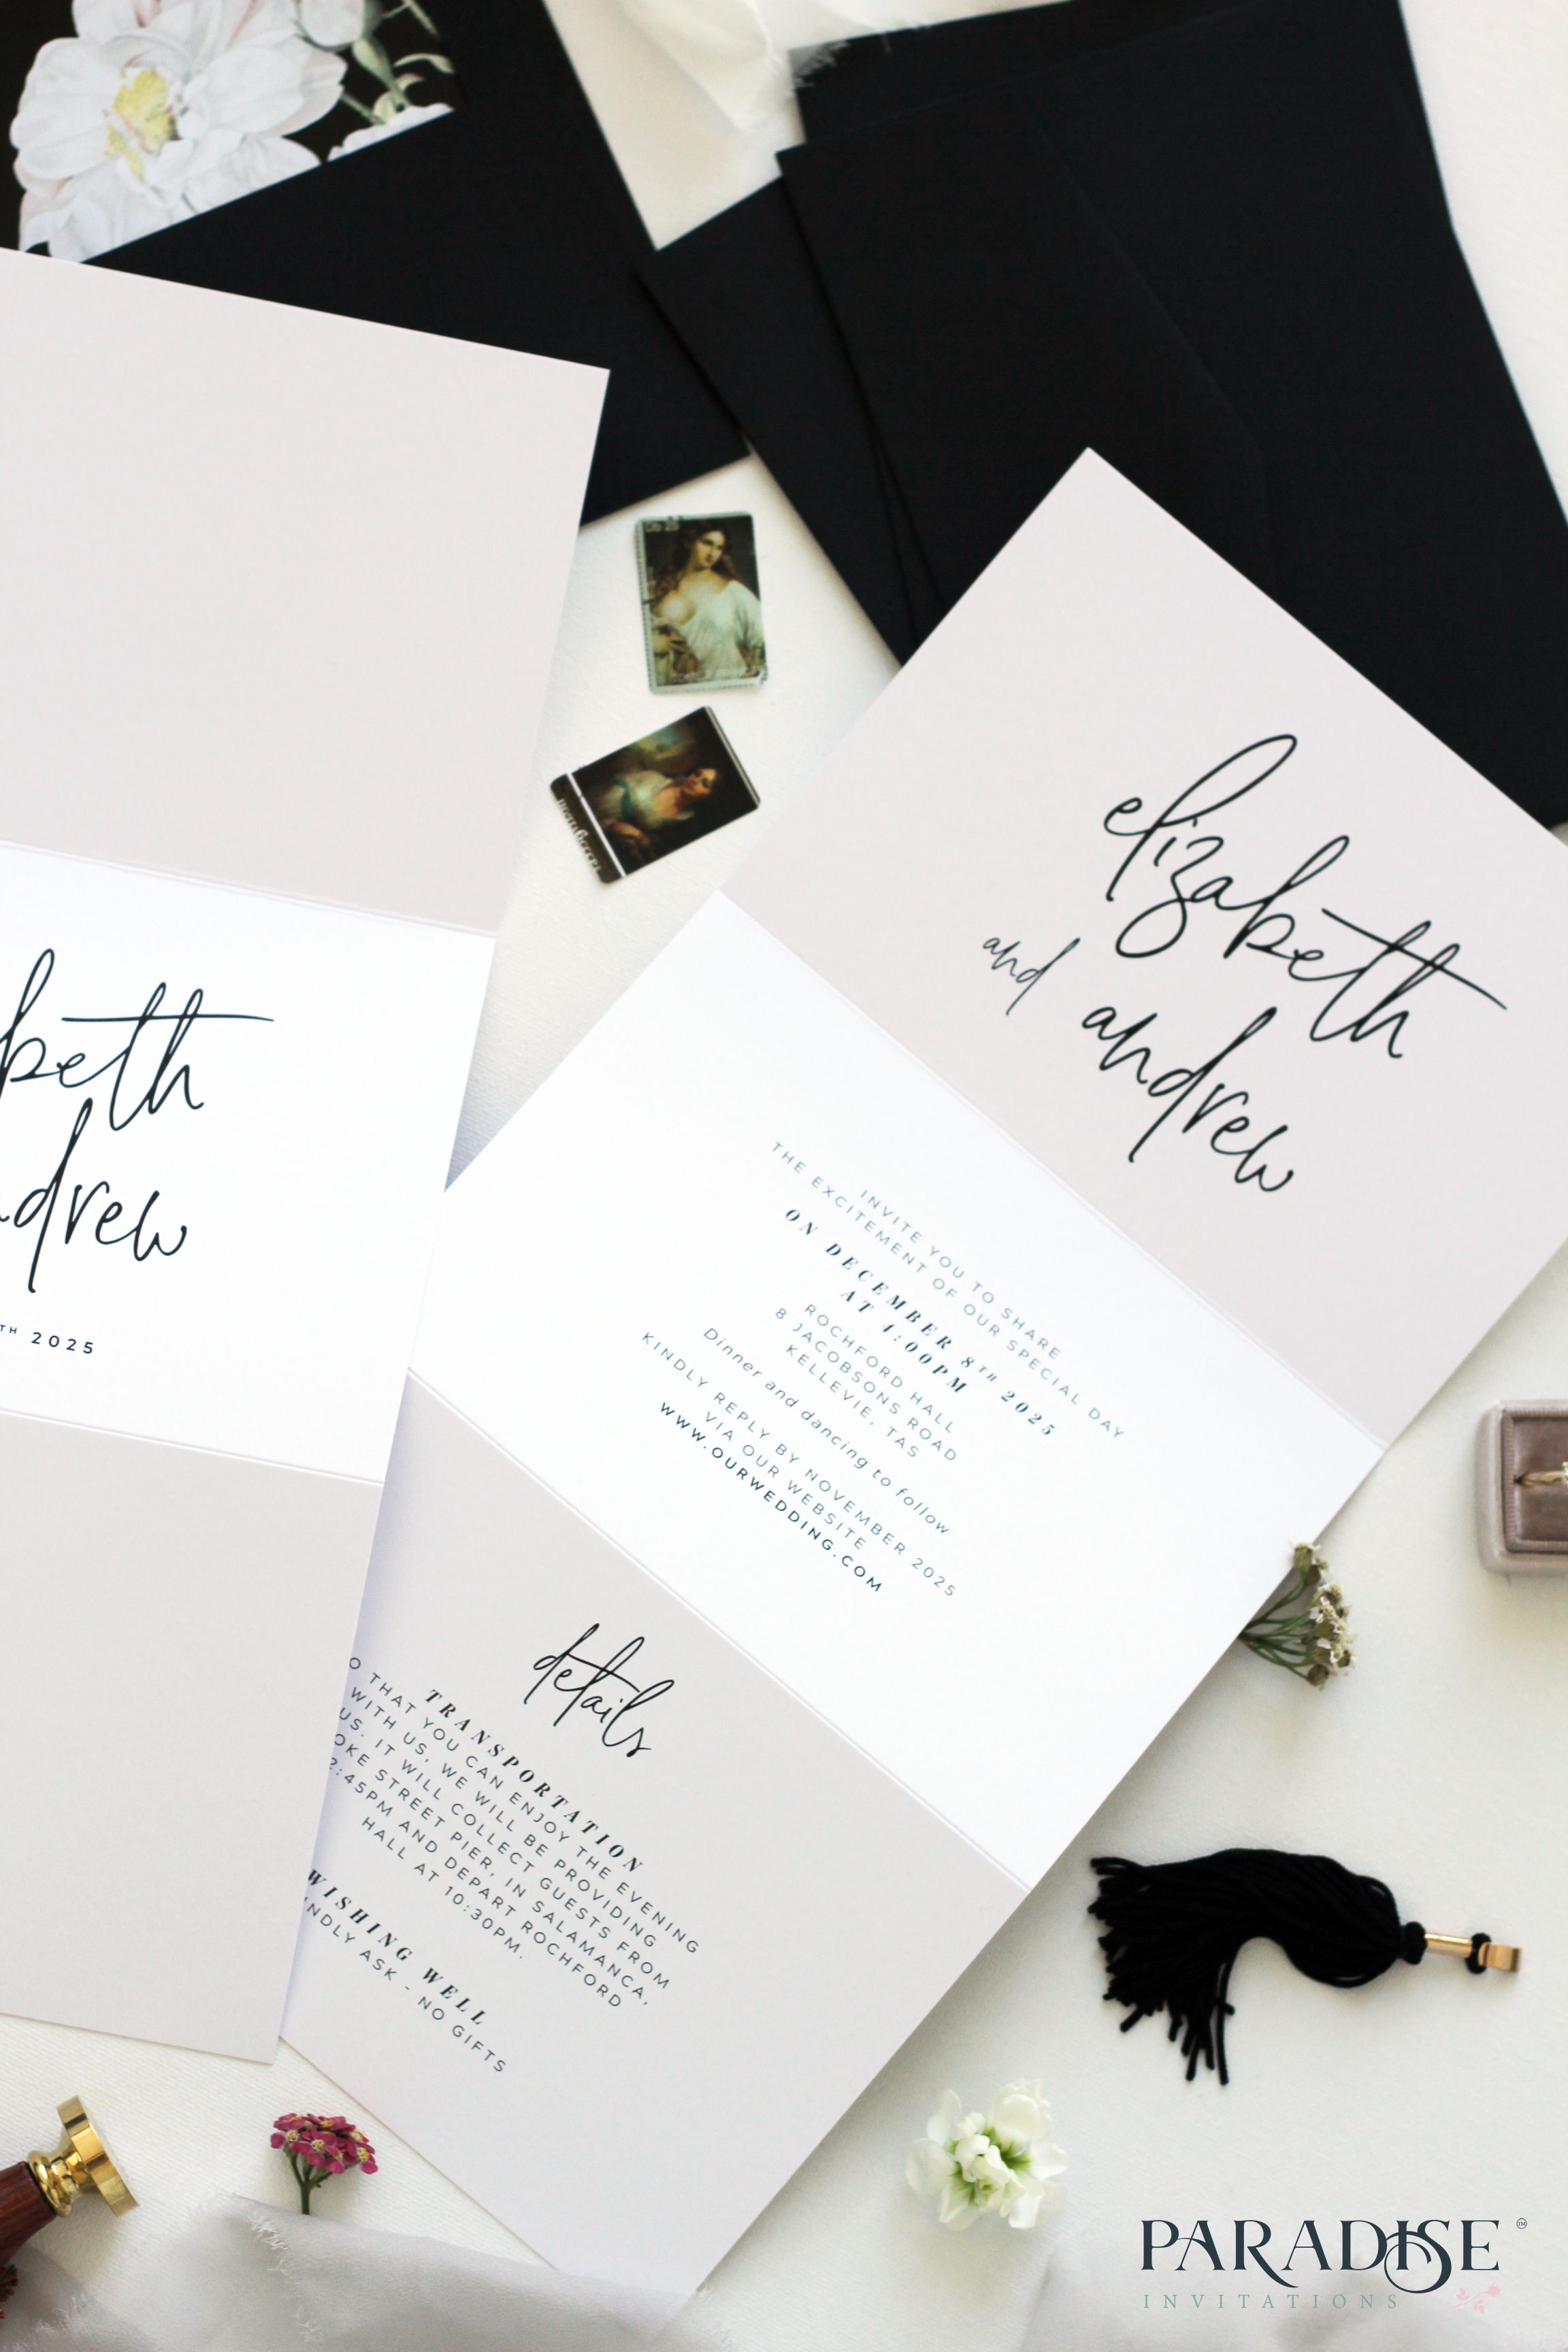 Fantine Protea Flower Tri Fold Wedding Invitation Wedding Invitation We Tri Fold Wedding Invitations Folded Wedding Invitation Wedding Invitations Australia